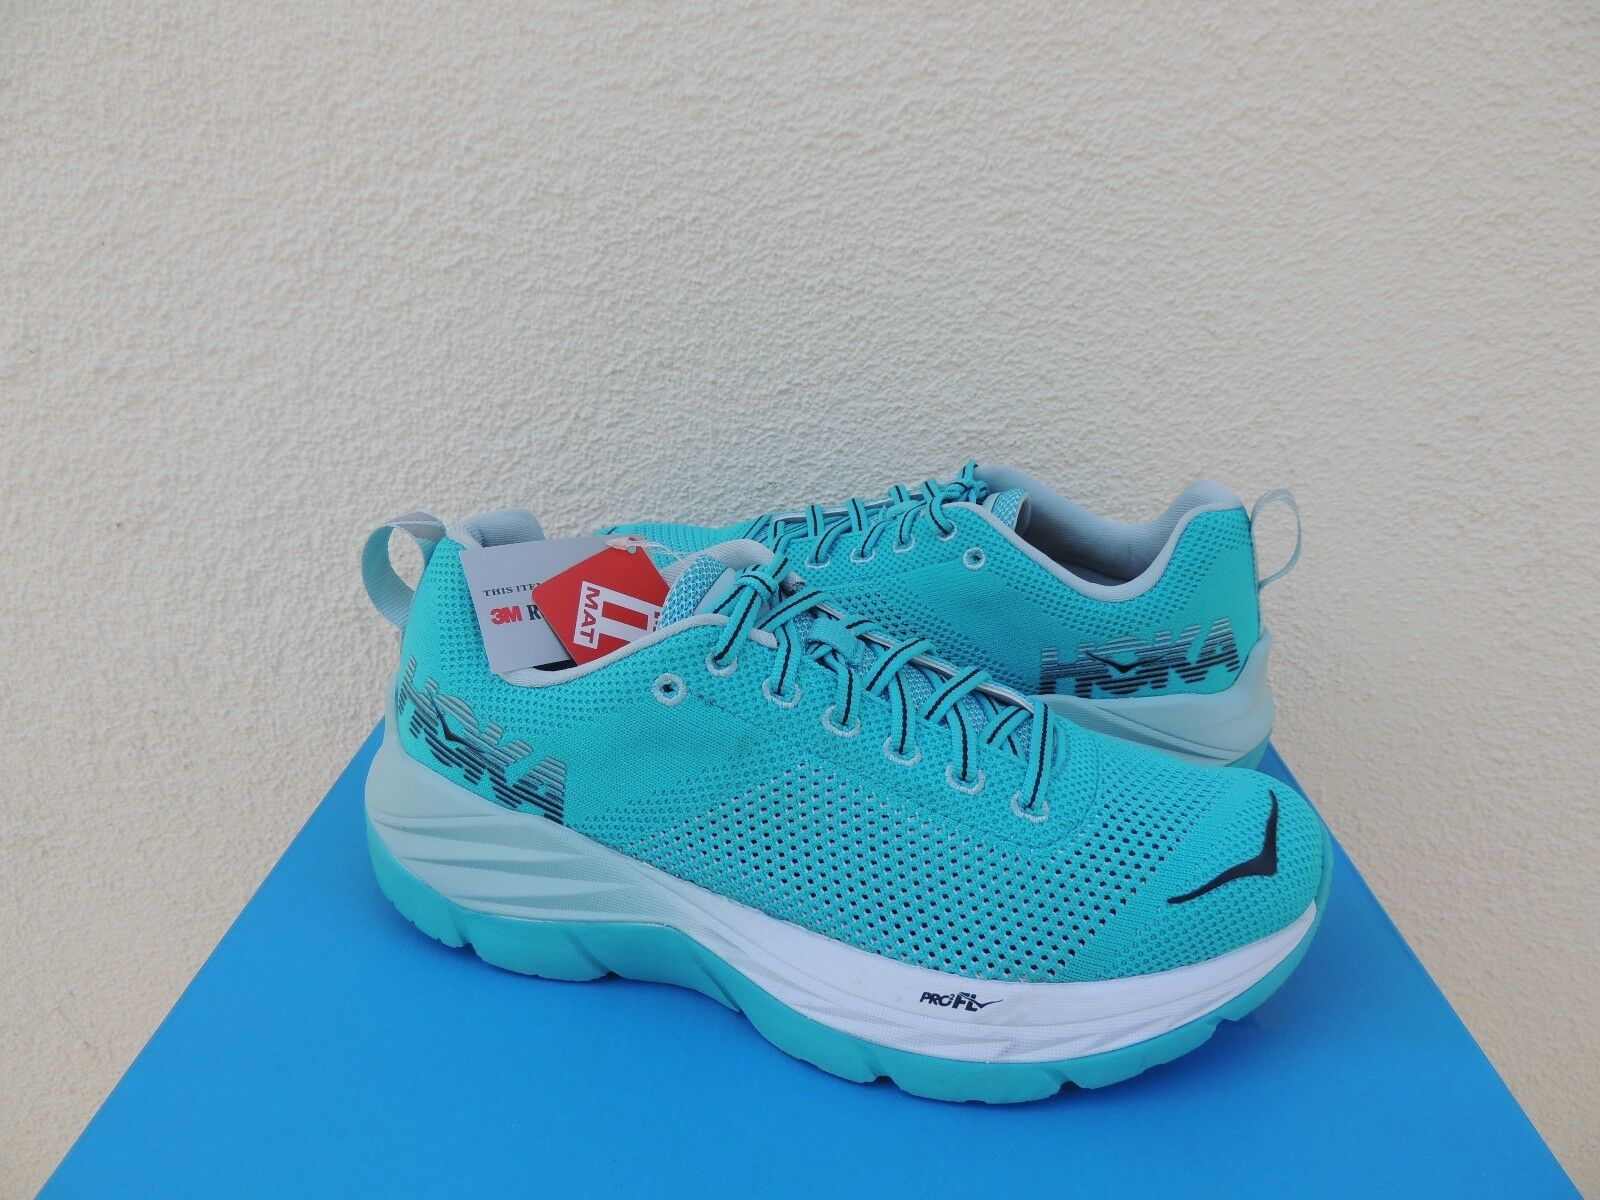 Hoka One One Mach Bluebird/Blanco zapatos  para mujer correr, de mujer para EE. UU. 7.5/39 1/3 euros  Nuevo 63f047